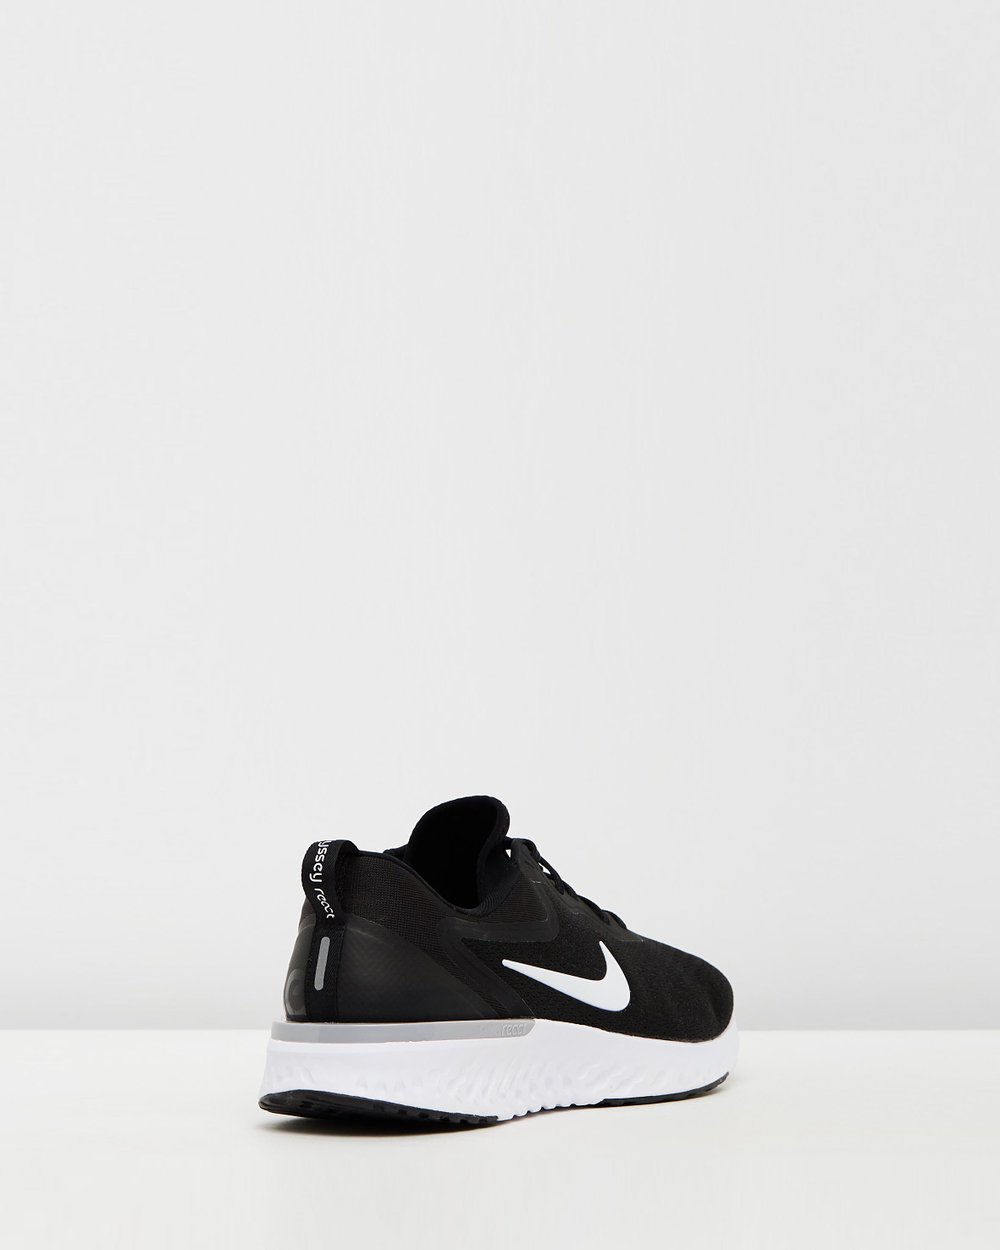 b0a8a08f54122 Nike Odyssey React - Men s by Nike Online